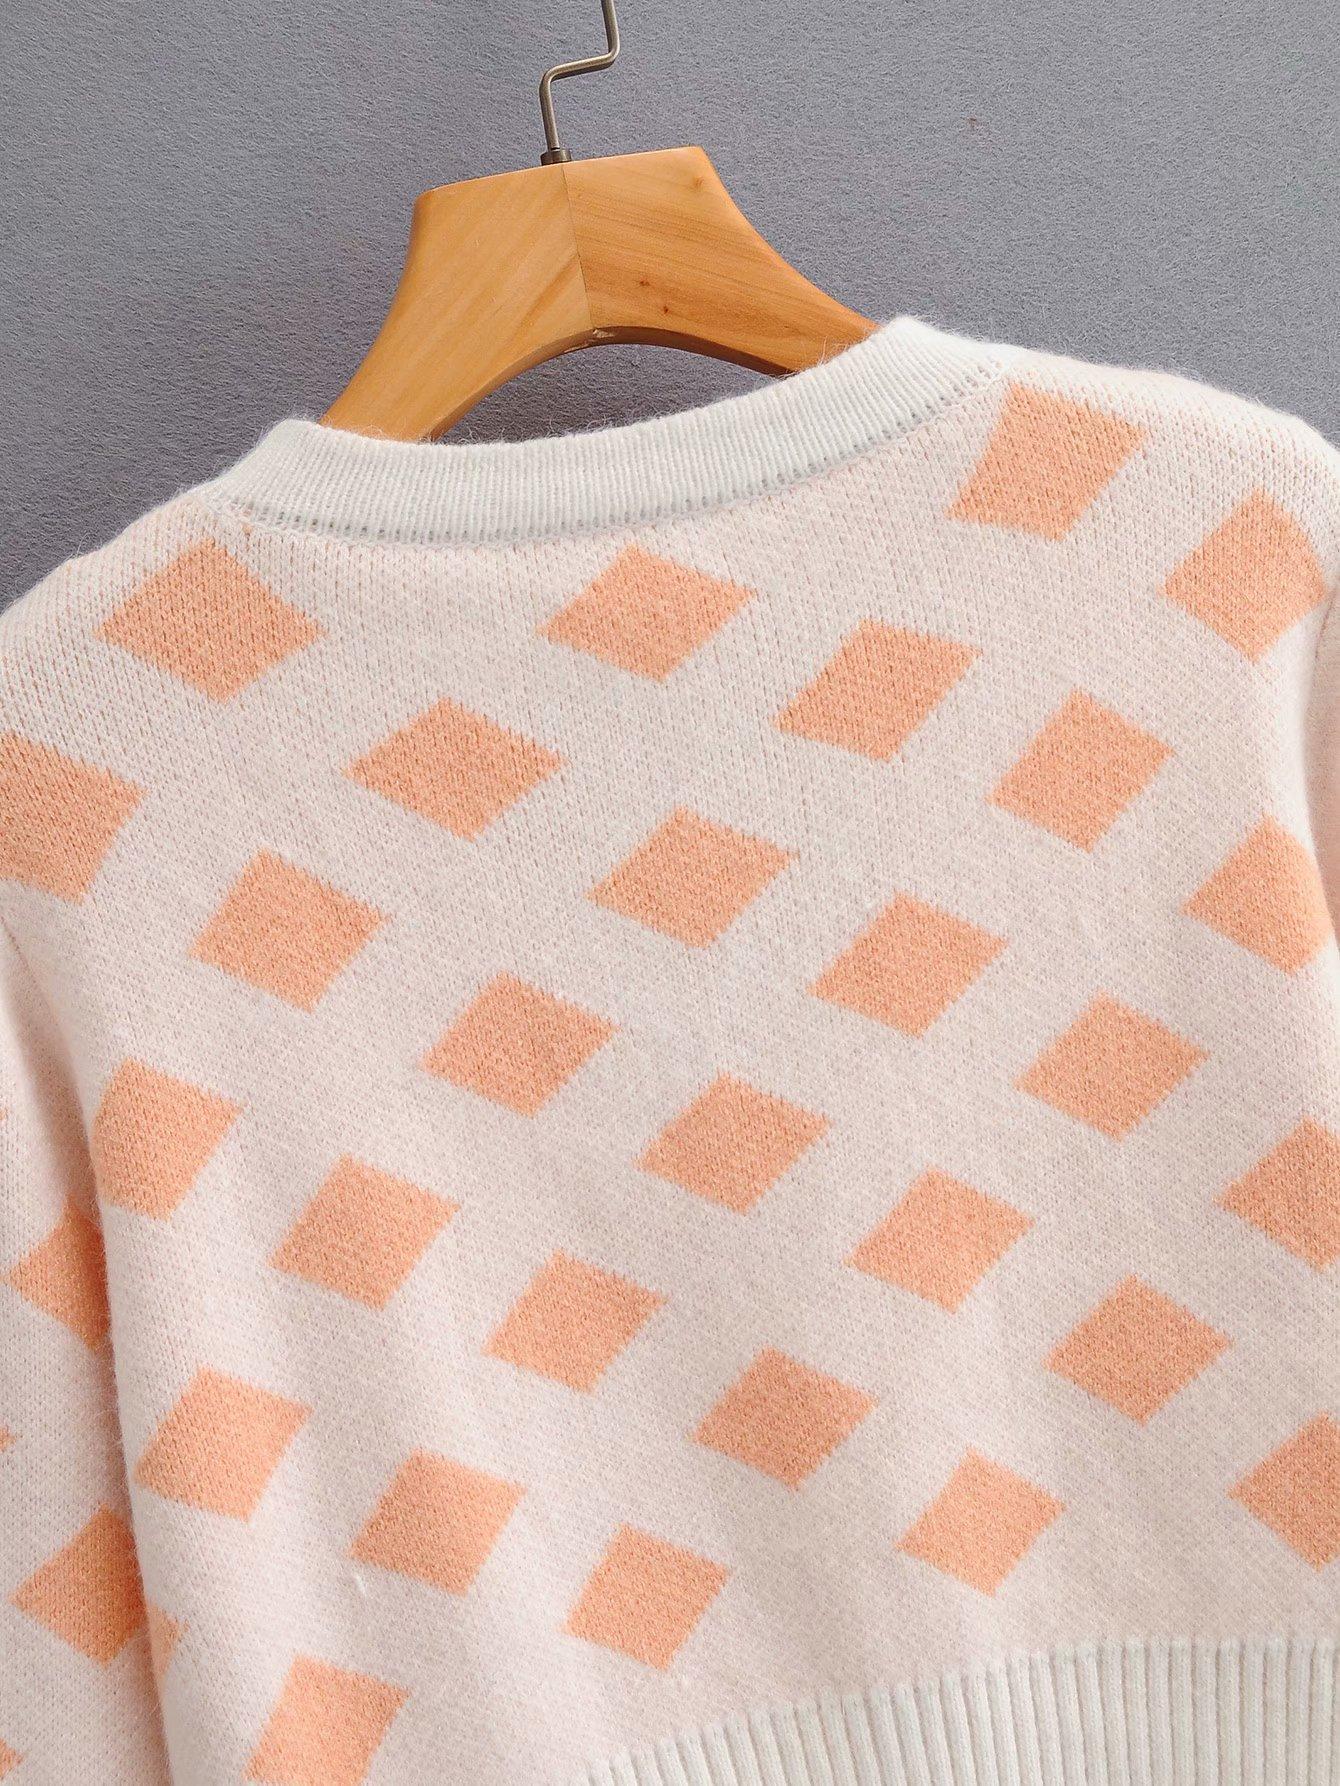 singlebreasted Vneck single piece longsleeved diamond pattern sweater coat wholesale nihaojewelry NHAM234736